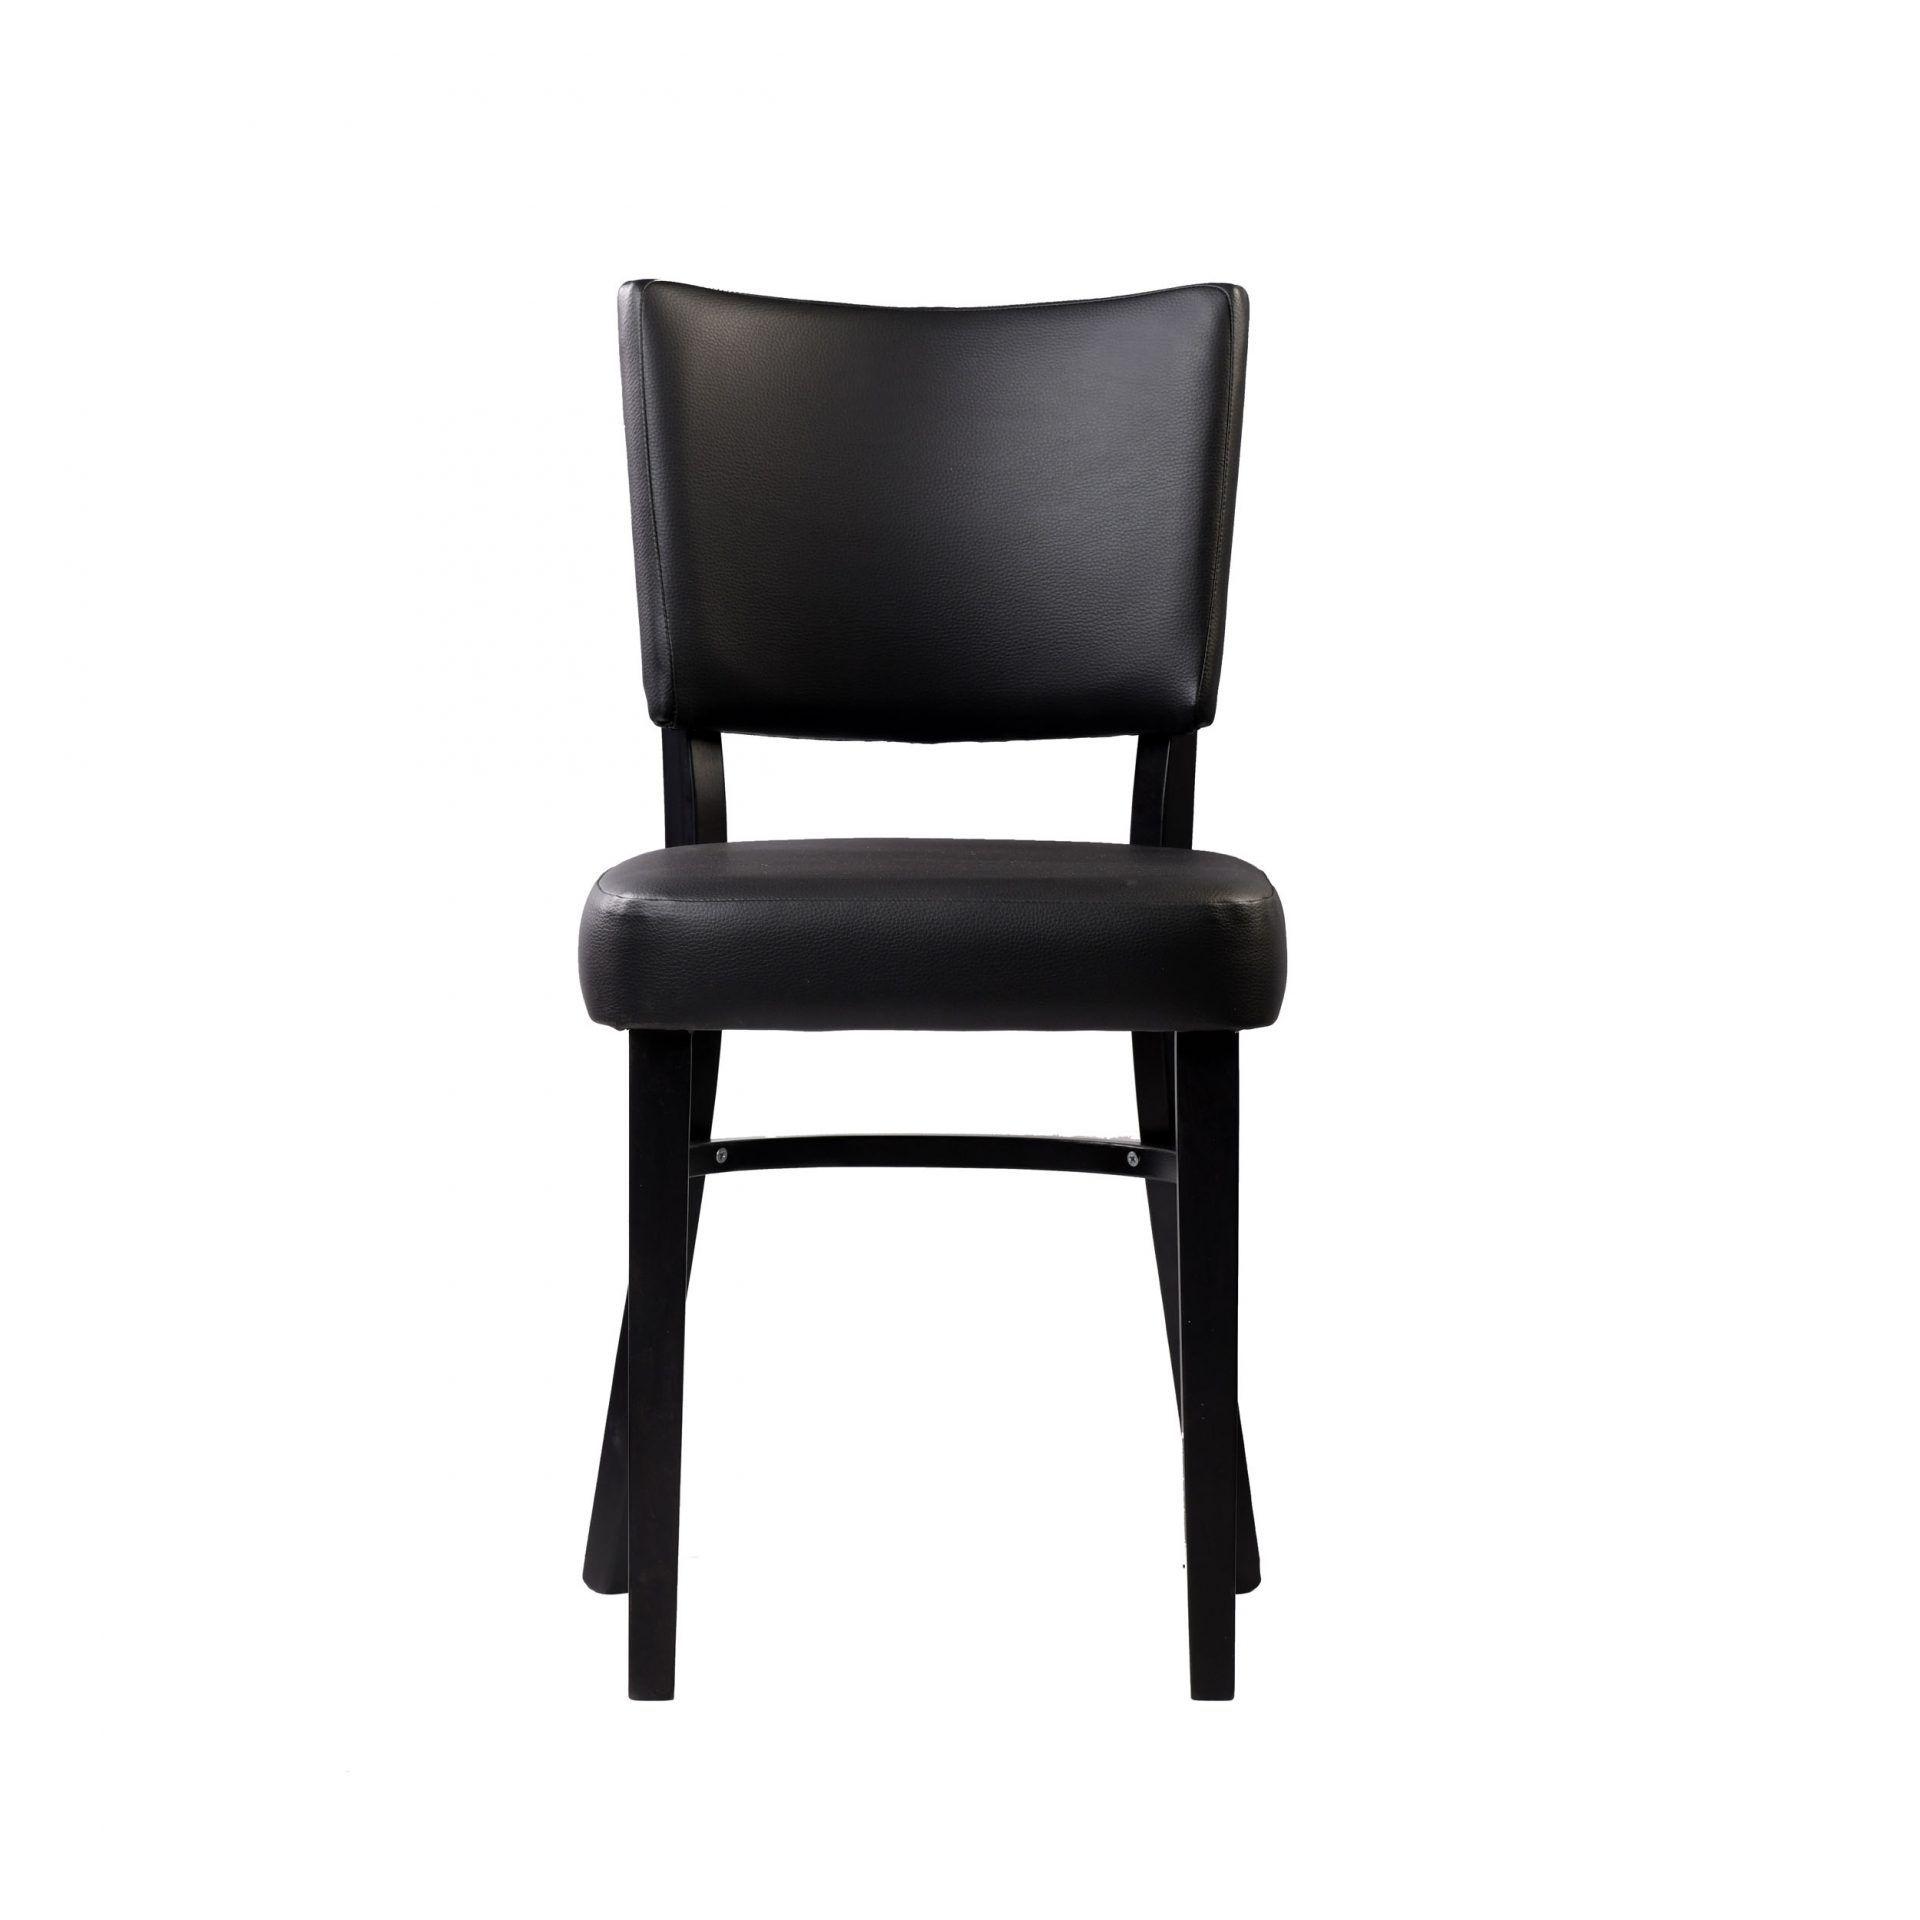 memphis chair black vinyl seat and backrest wenge frame front